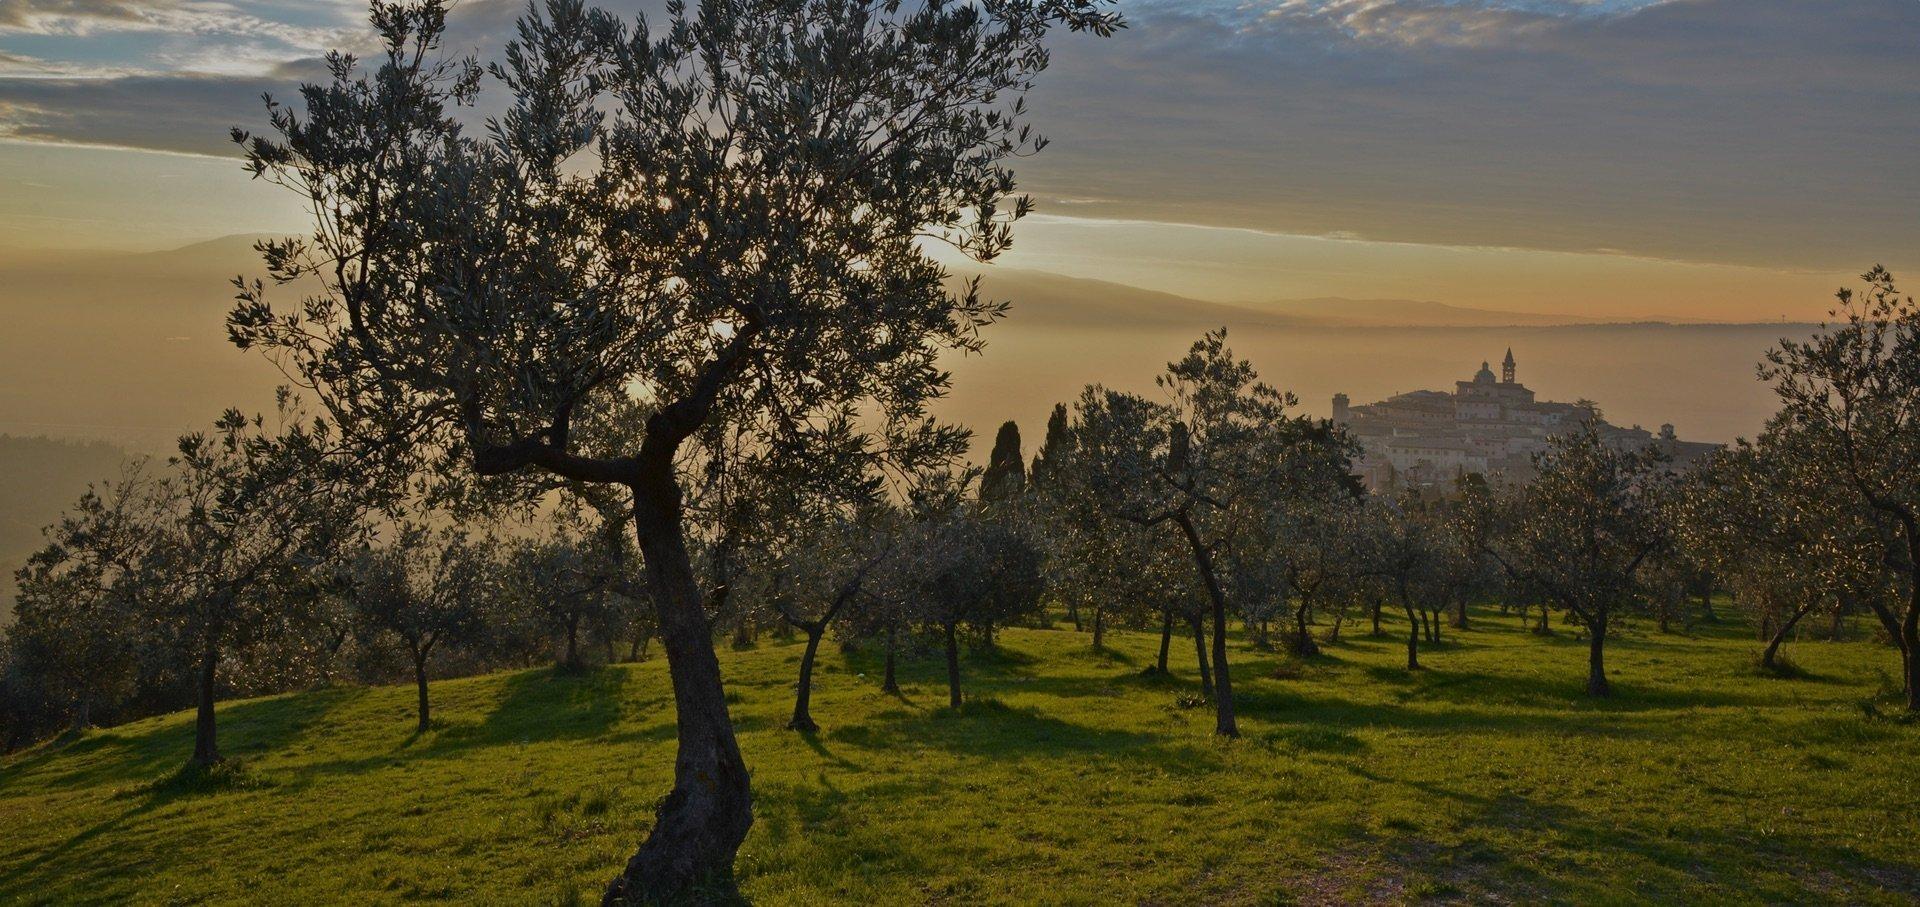 Convegno su fascia olivetata pedemontana Assisi-Foligno-Spoleto